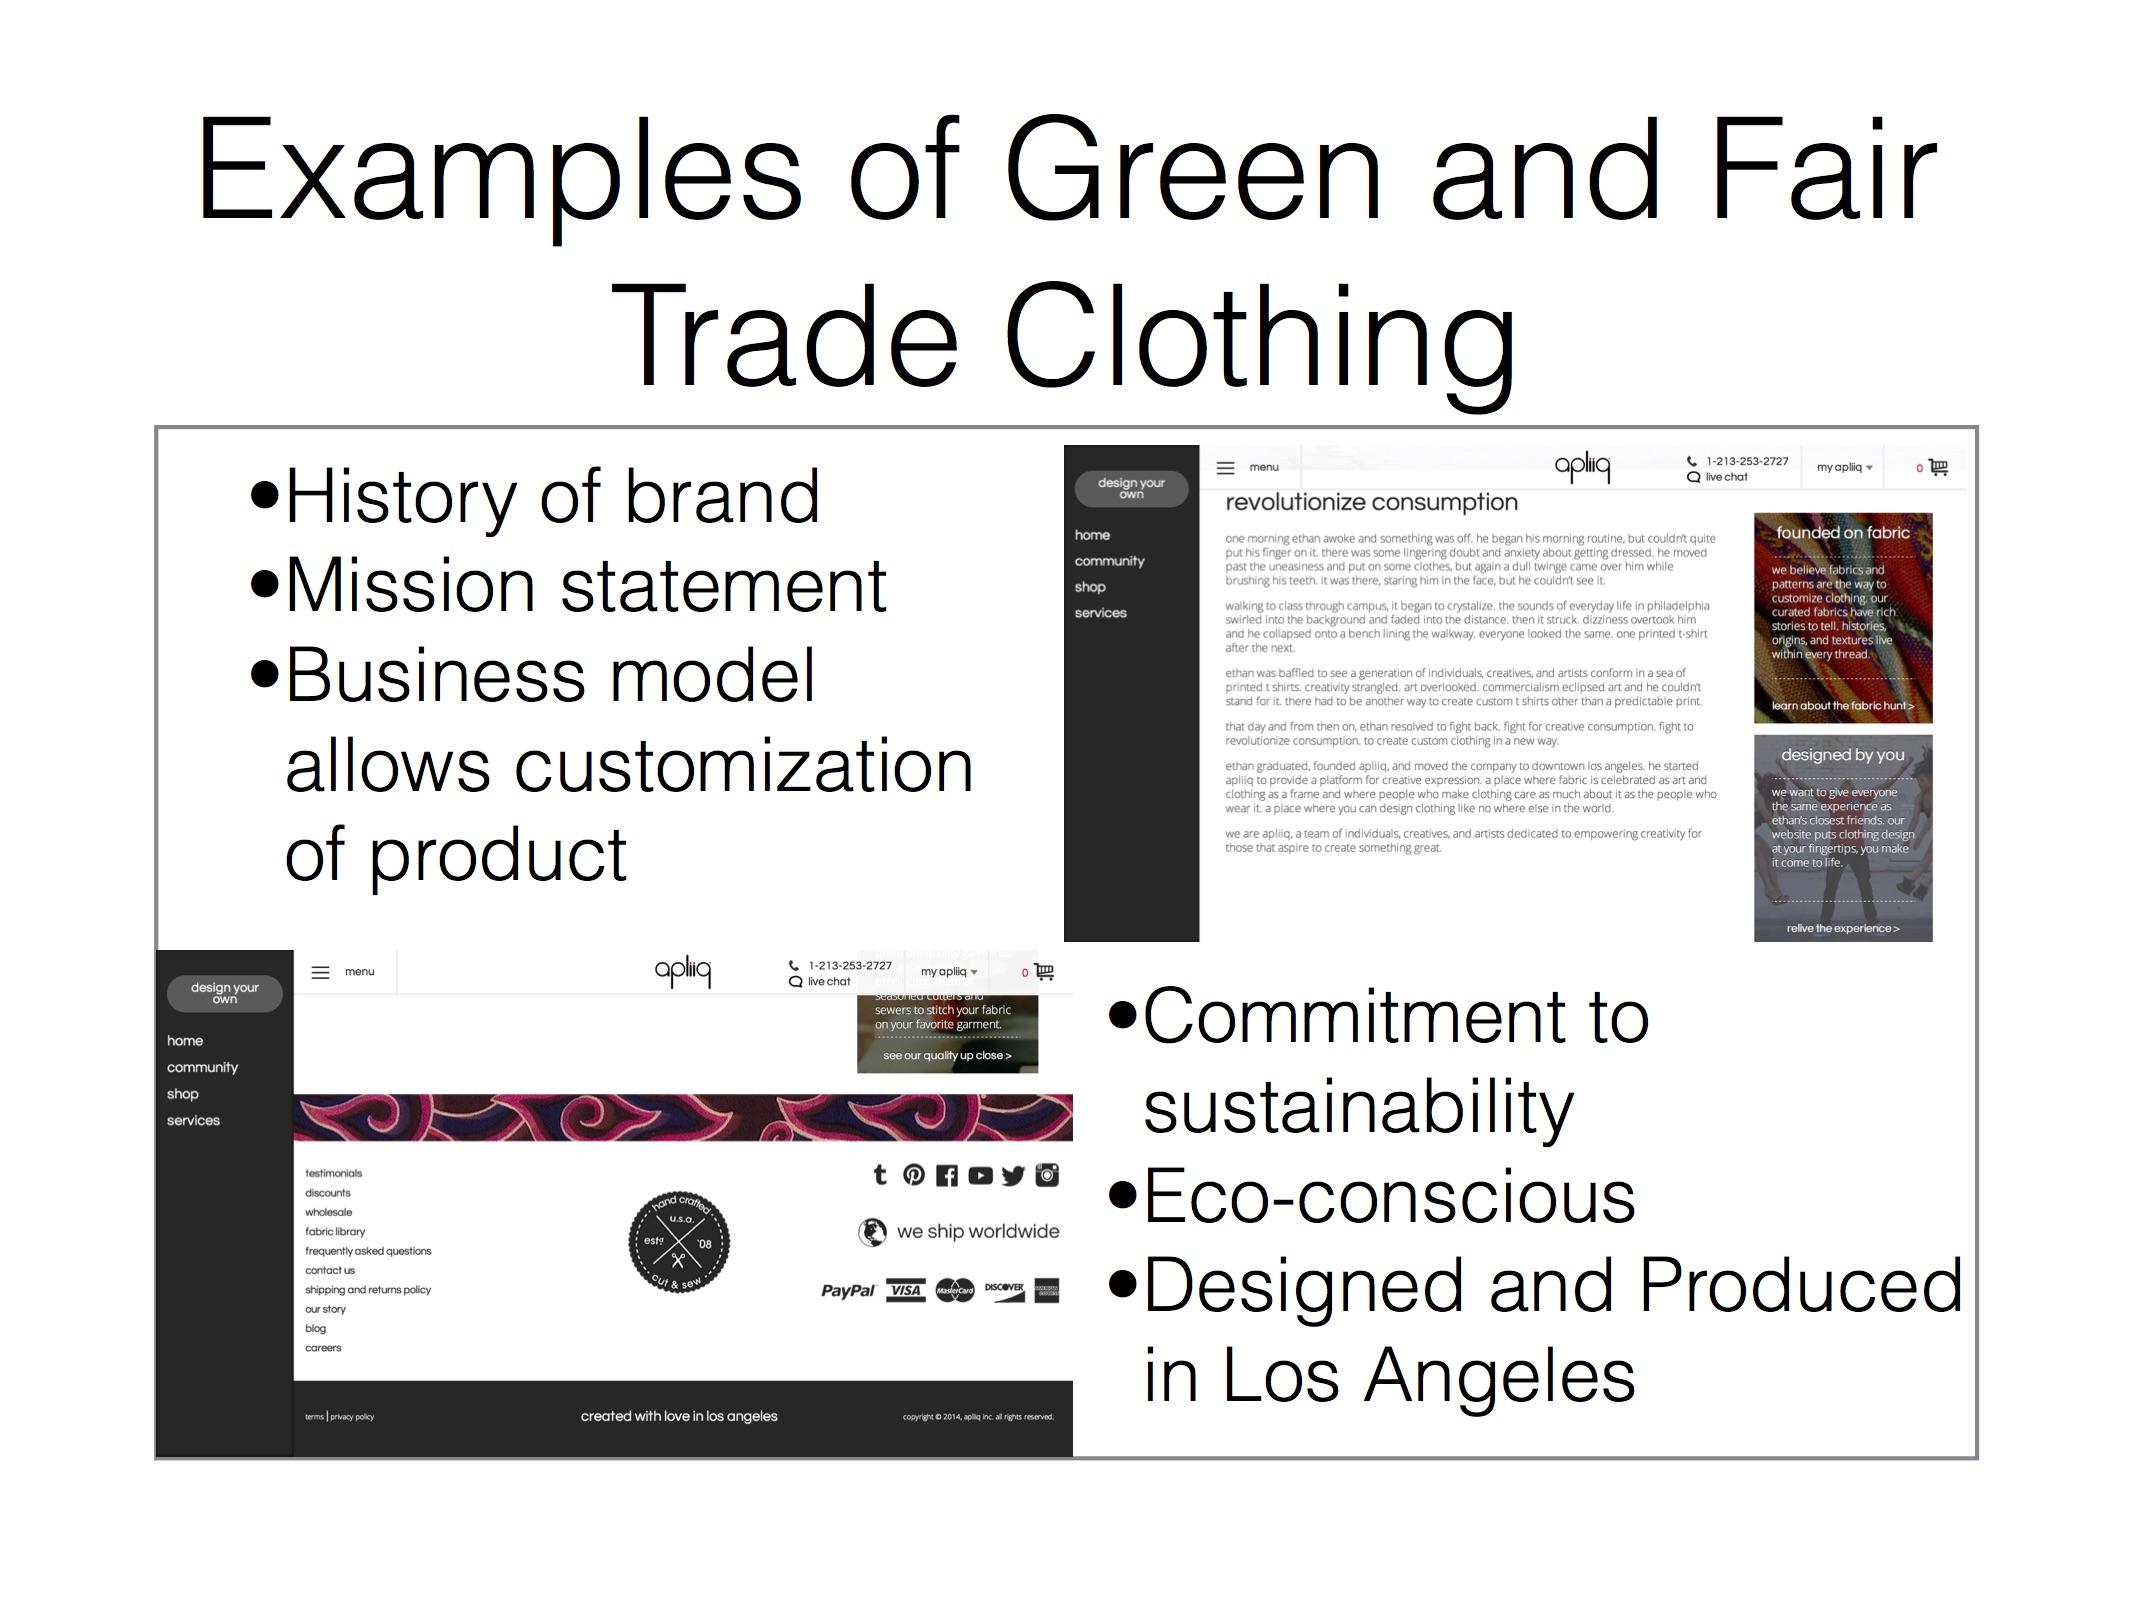 green_fairtrade.jpg